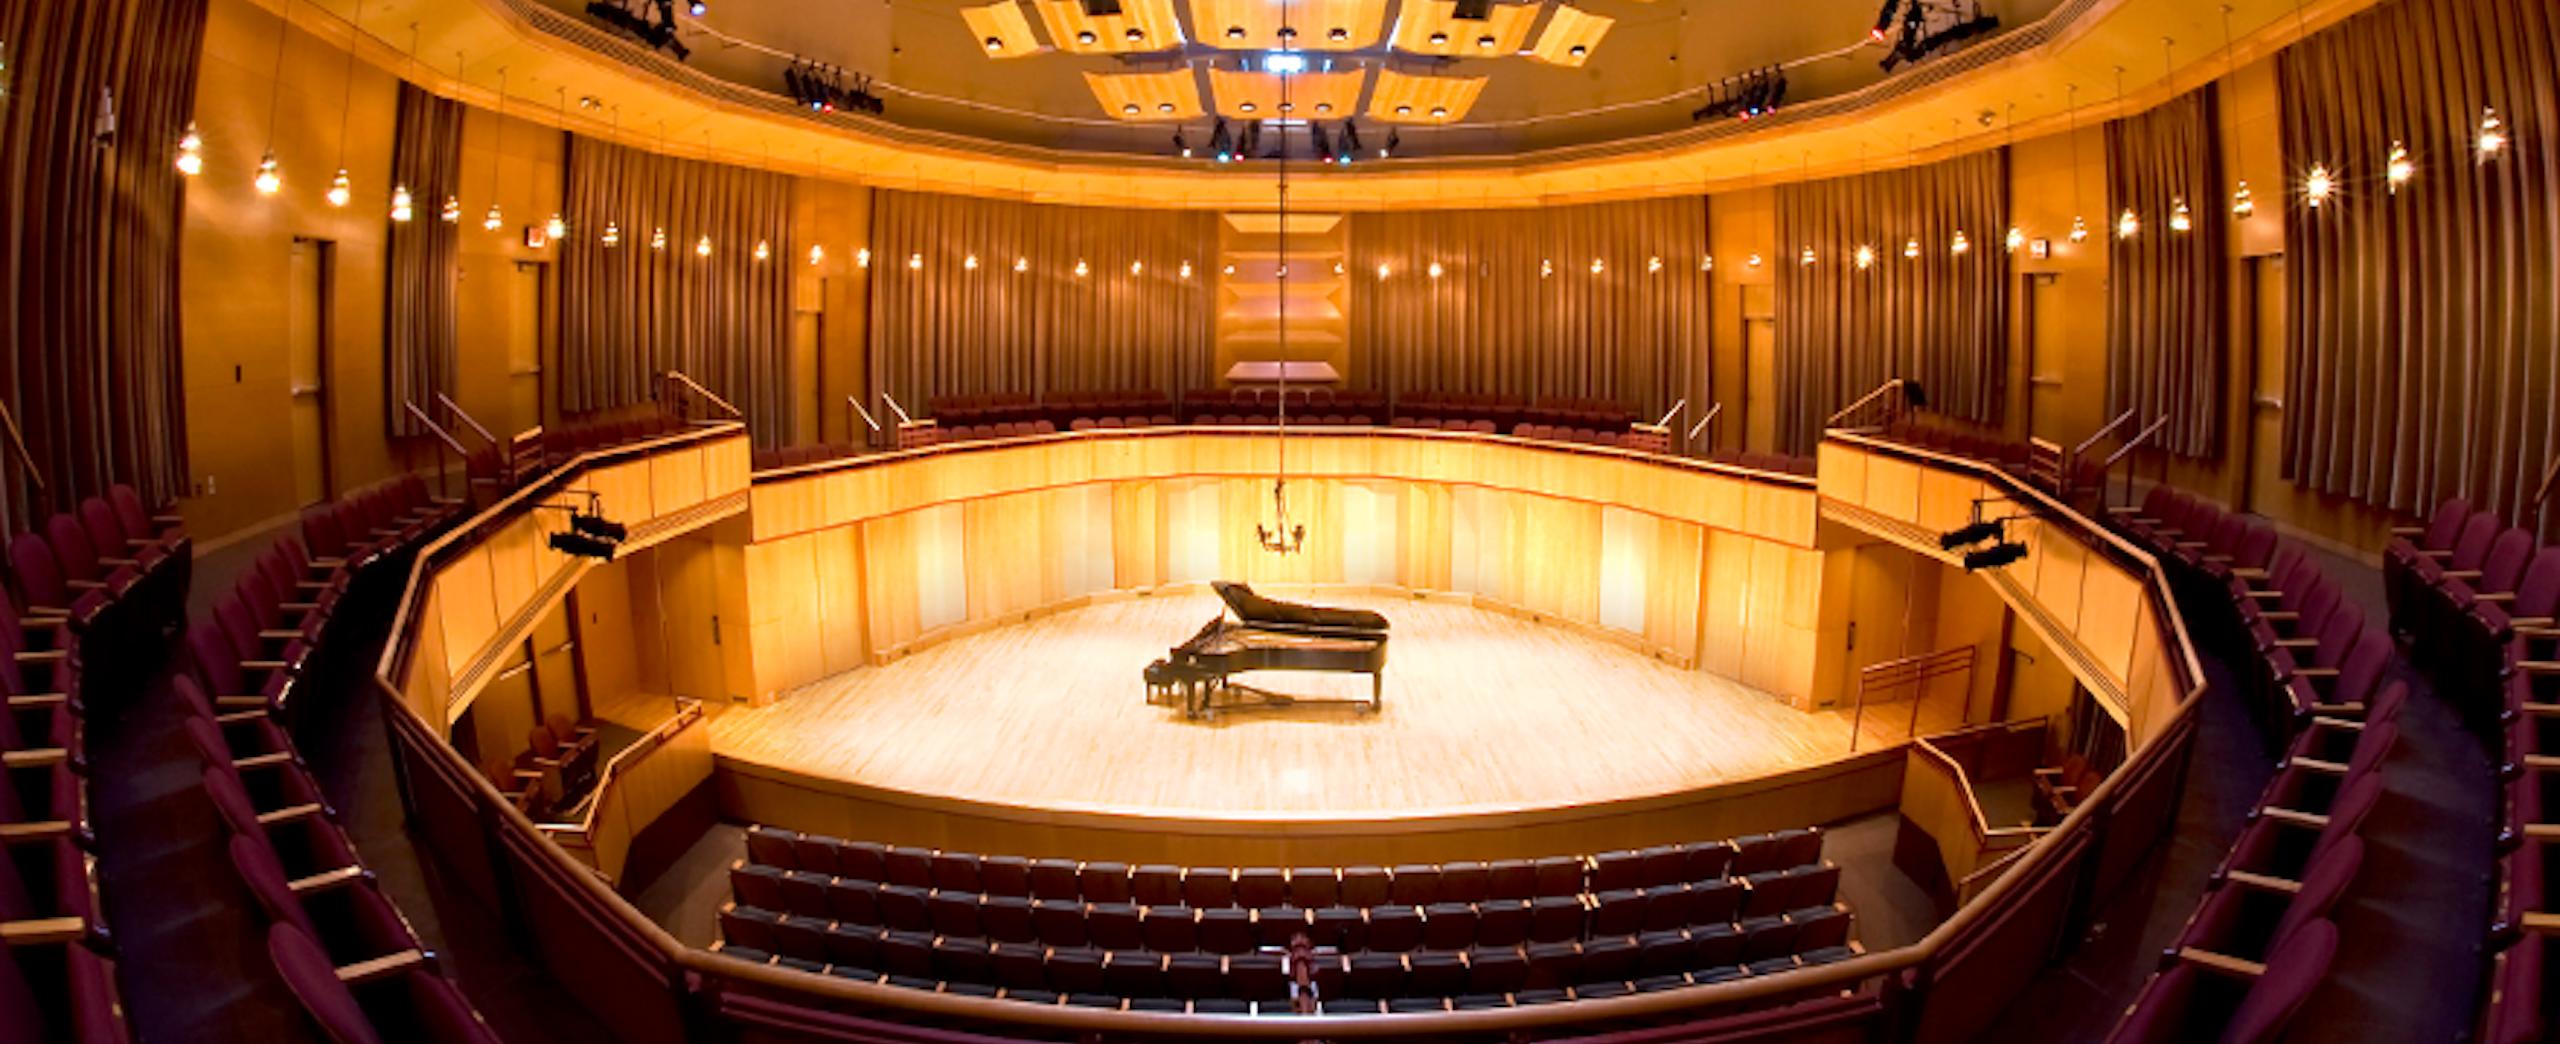 Weber Music Hall